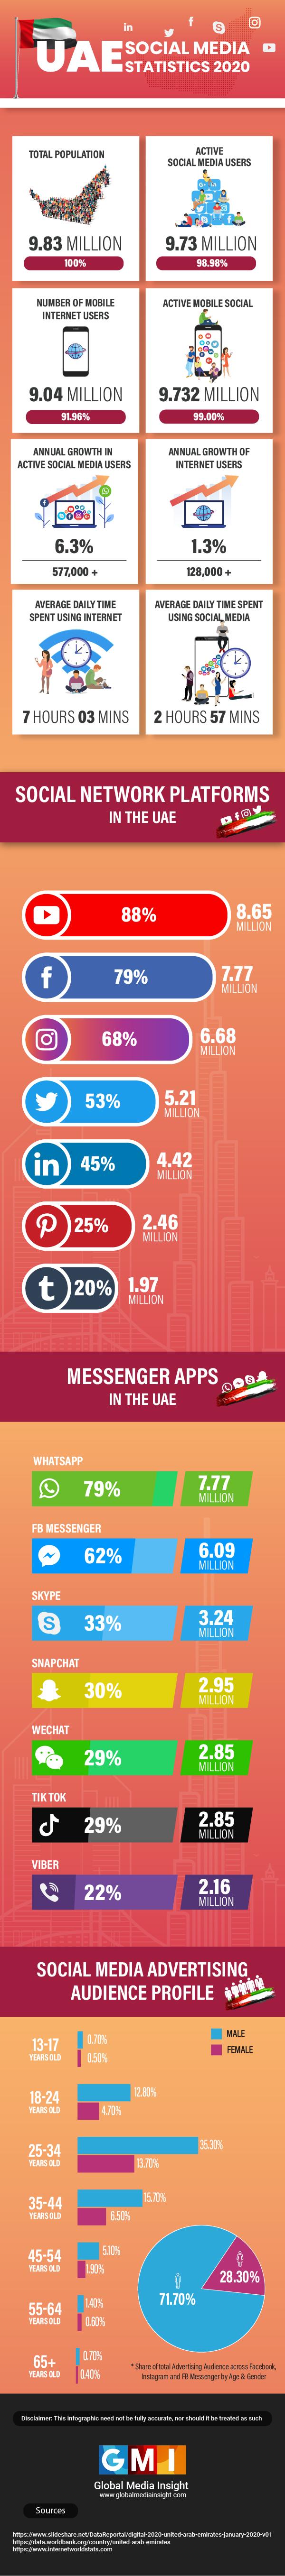 UAE Social Media Statistics